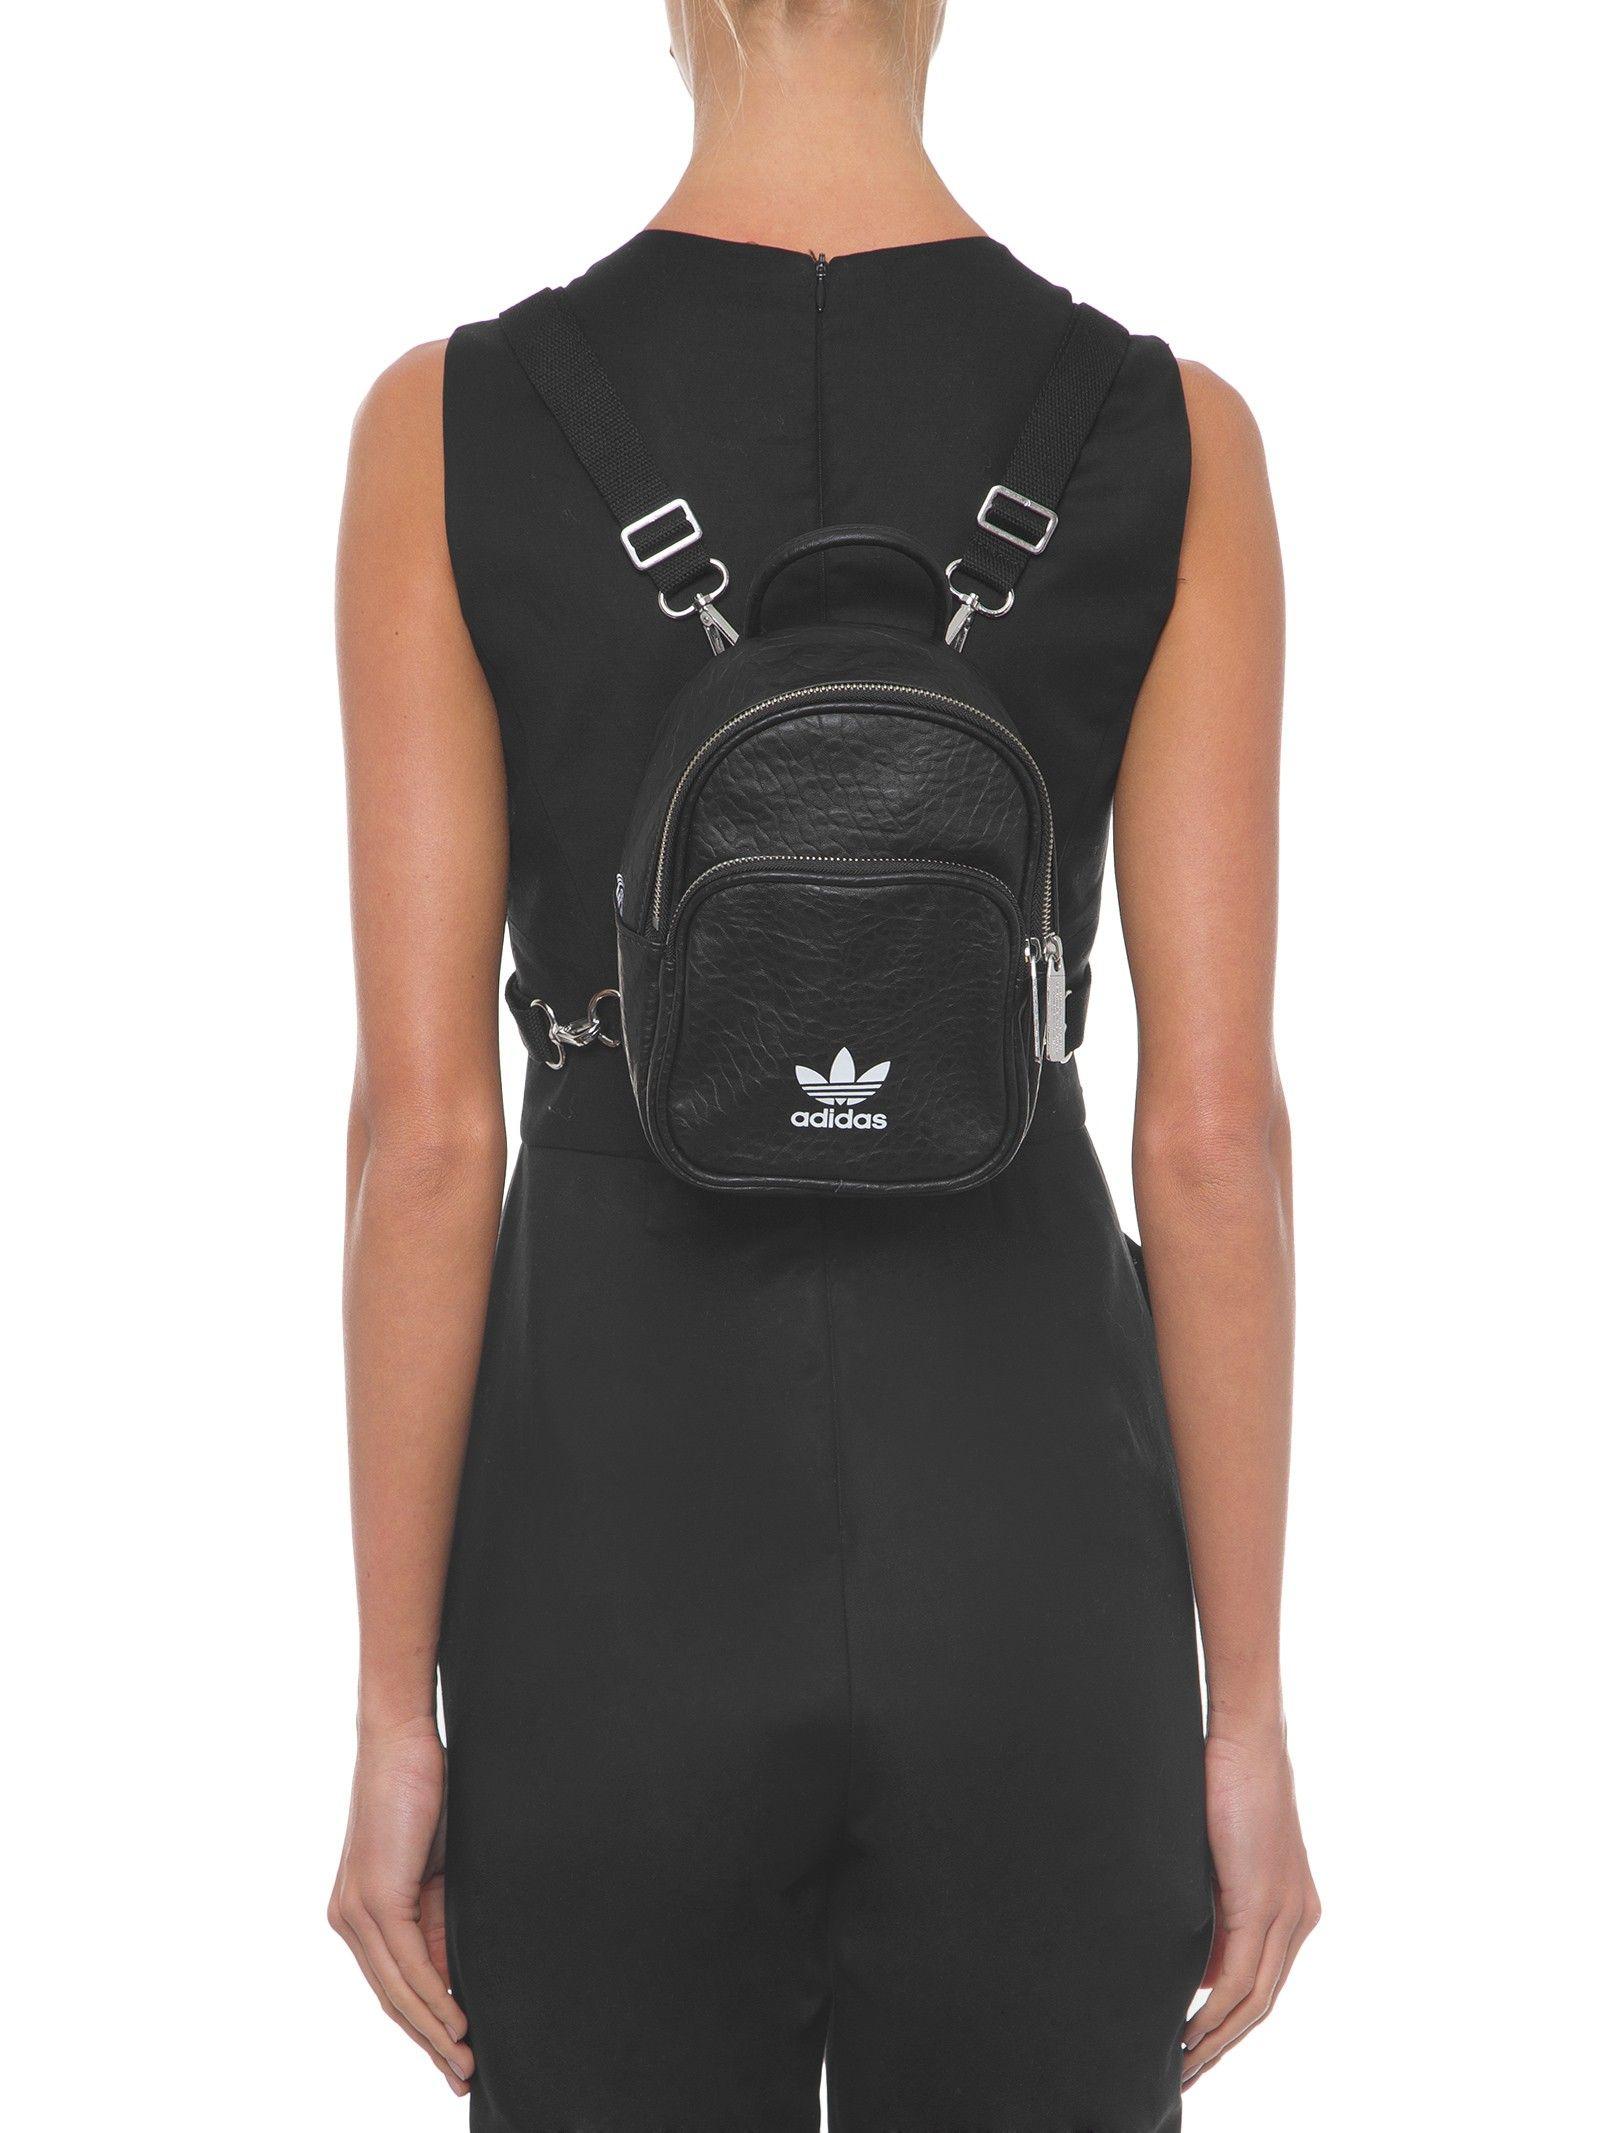 8eae2e6c0 Mochila Mini Classic - Adidas Originals - Preto - Shop2gether ...